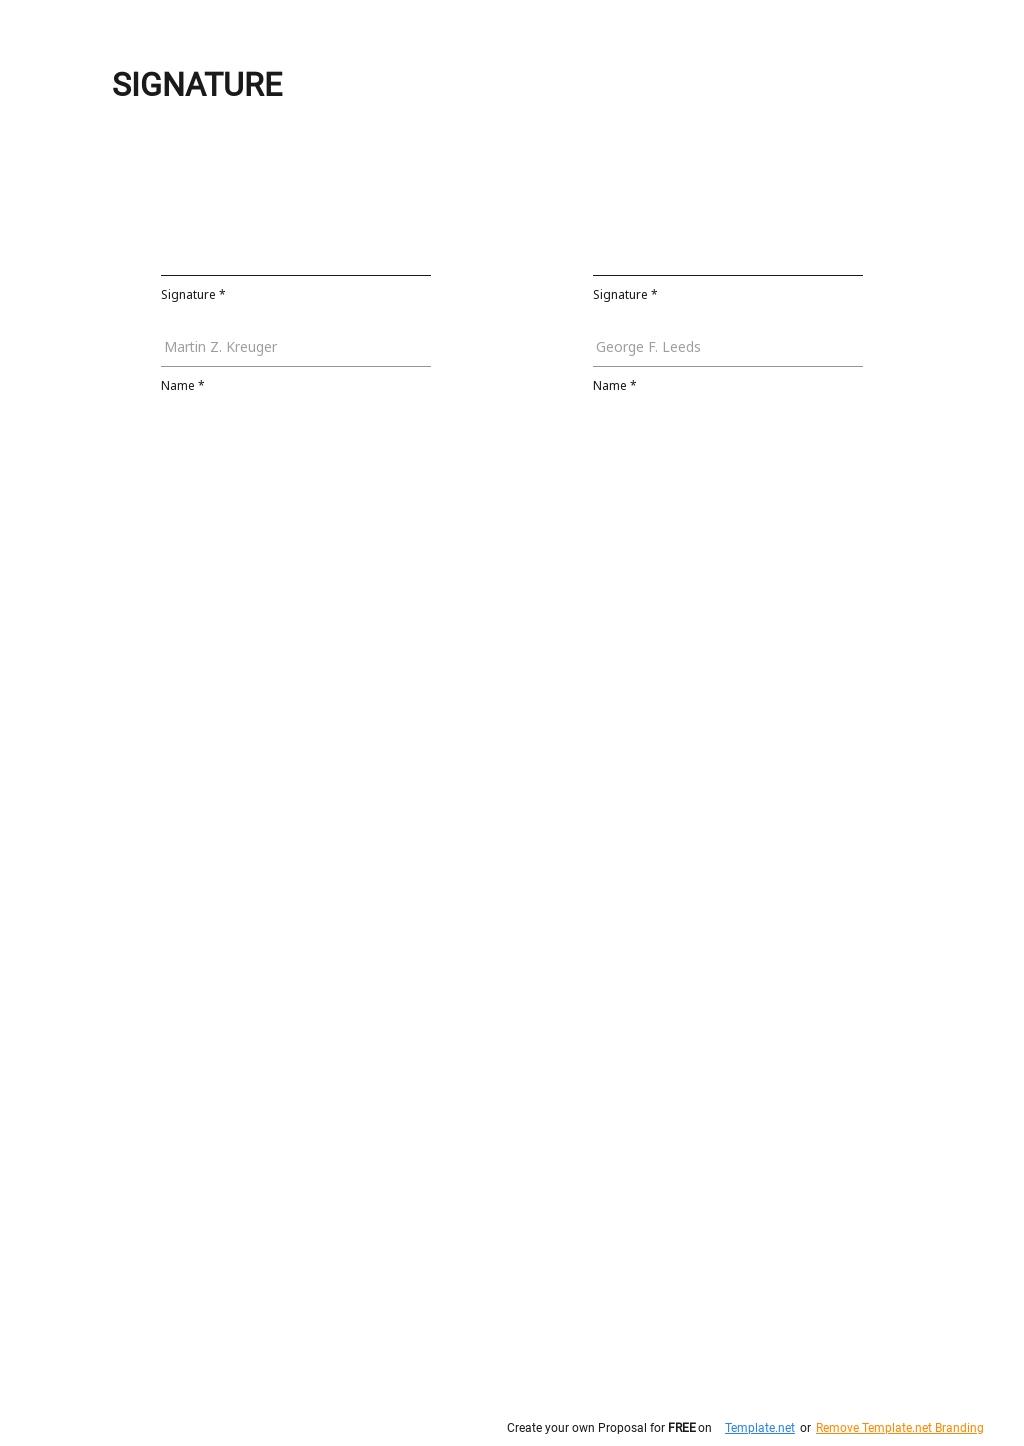 House Rental Agreement Template 2.jpe